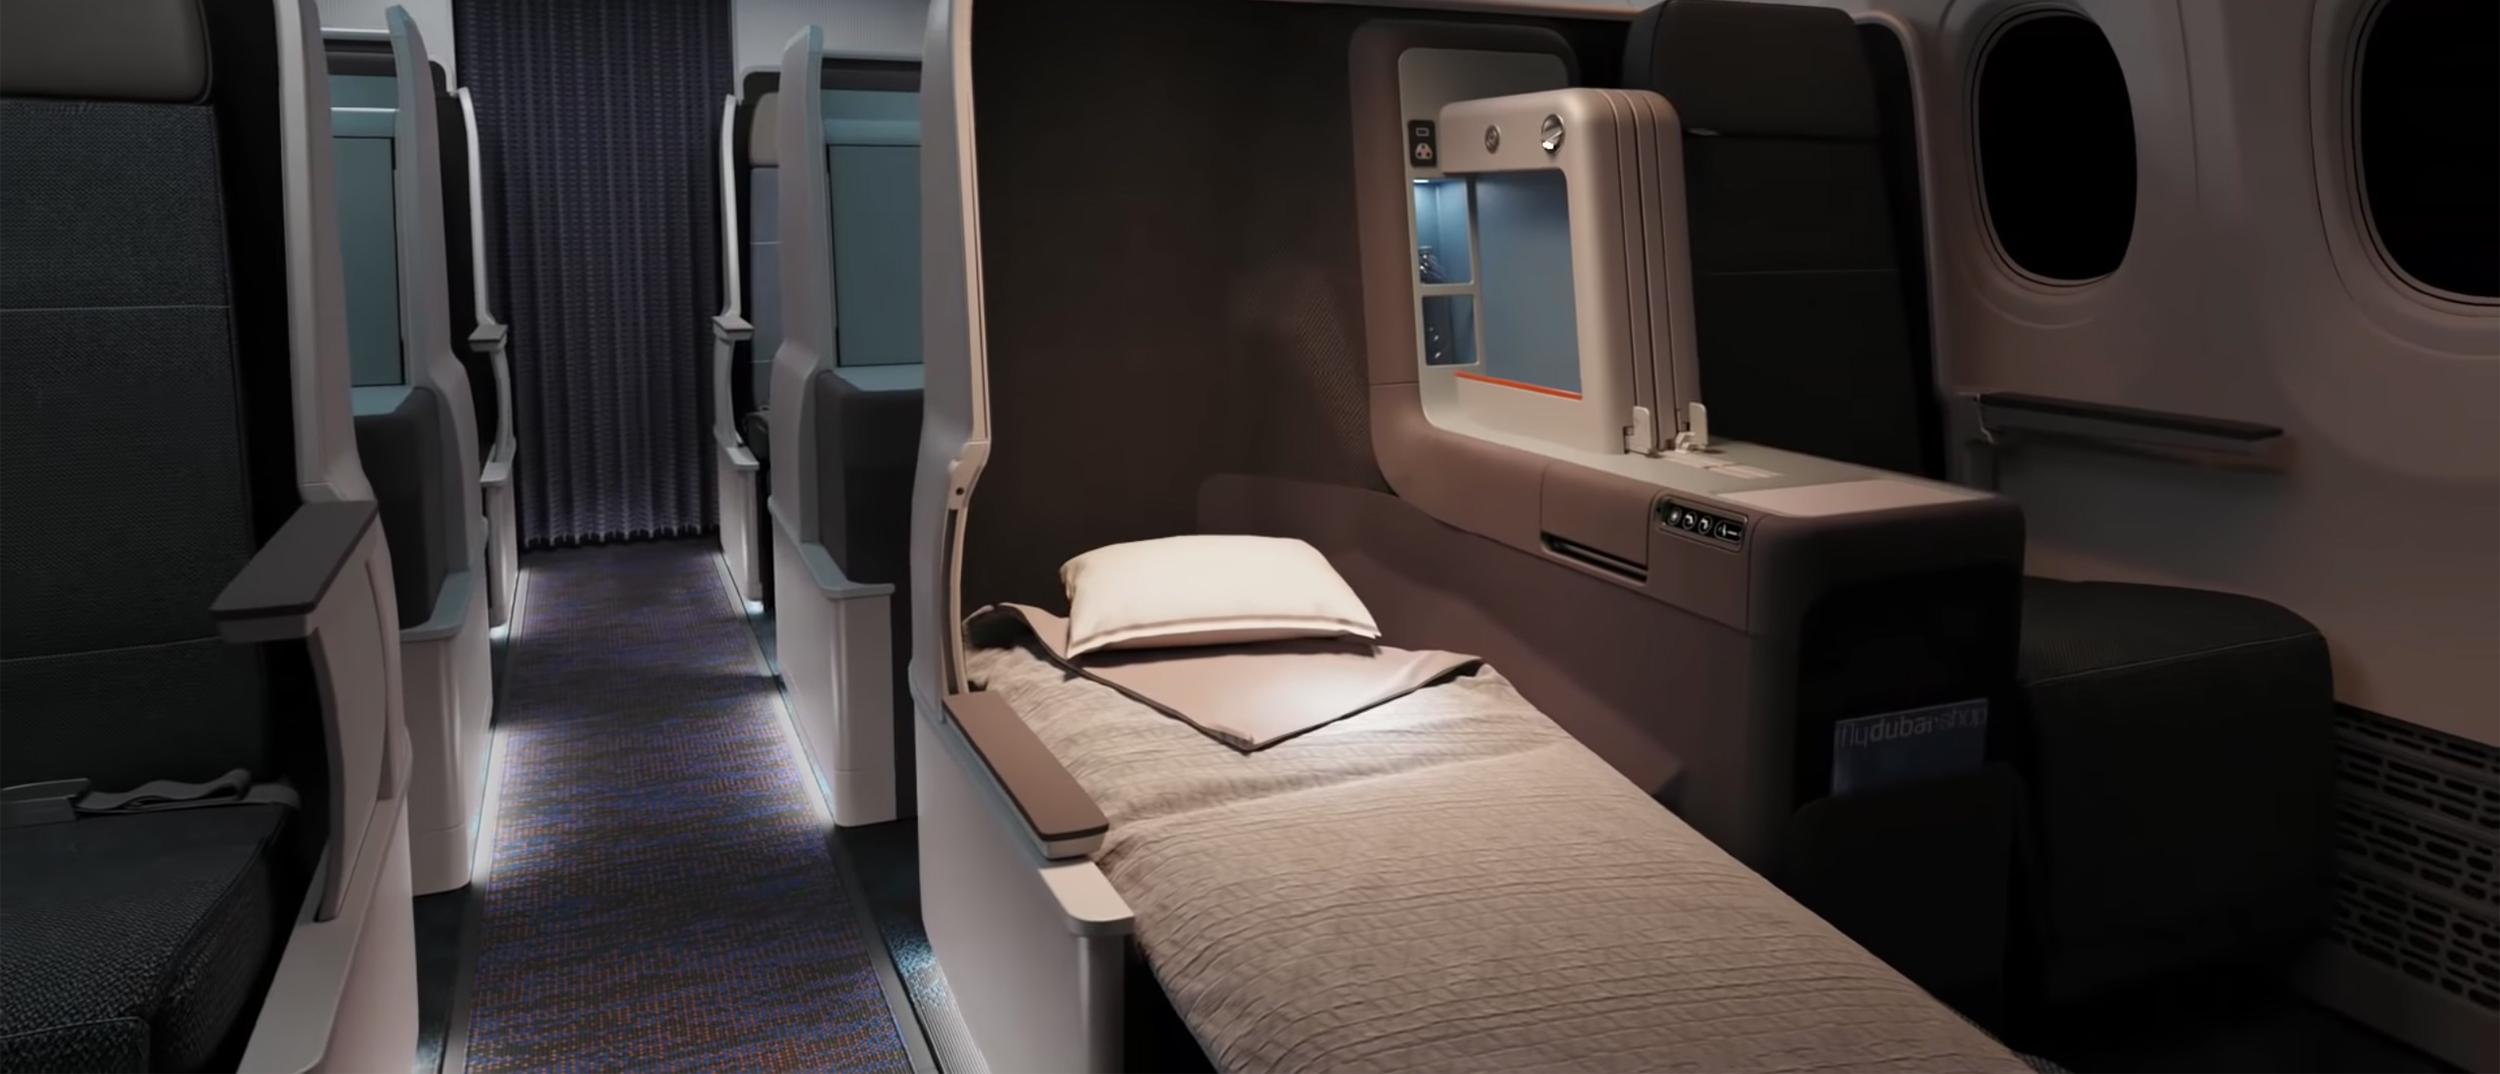 flydubai 737 MAX Biz 2 (flydubai).jpg